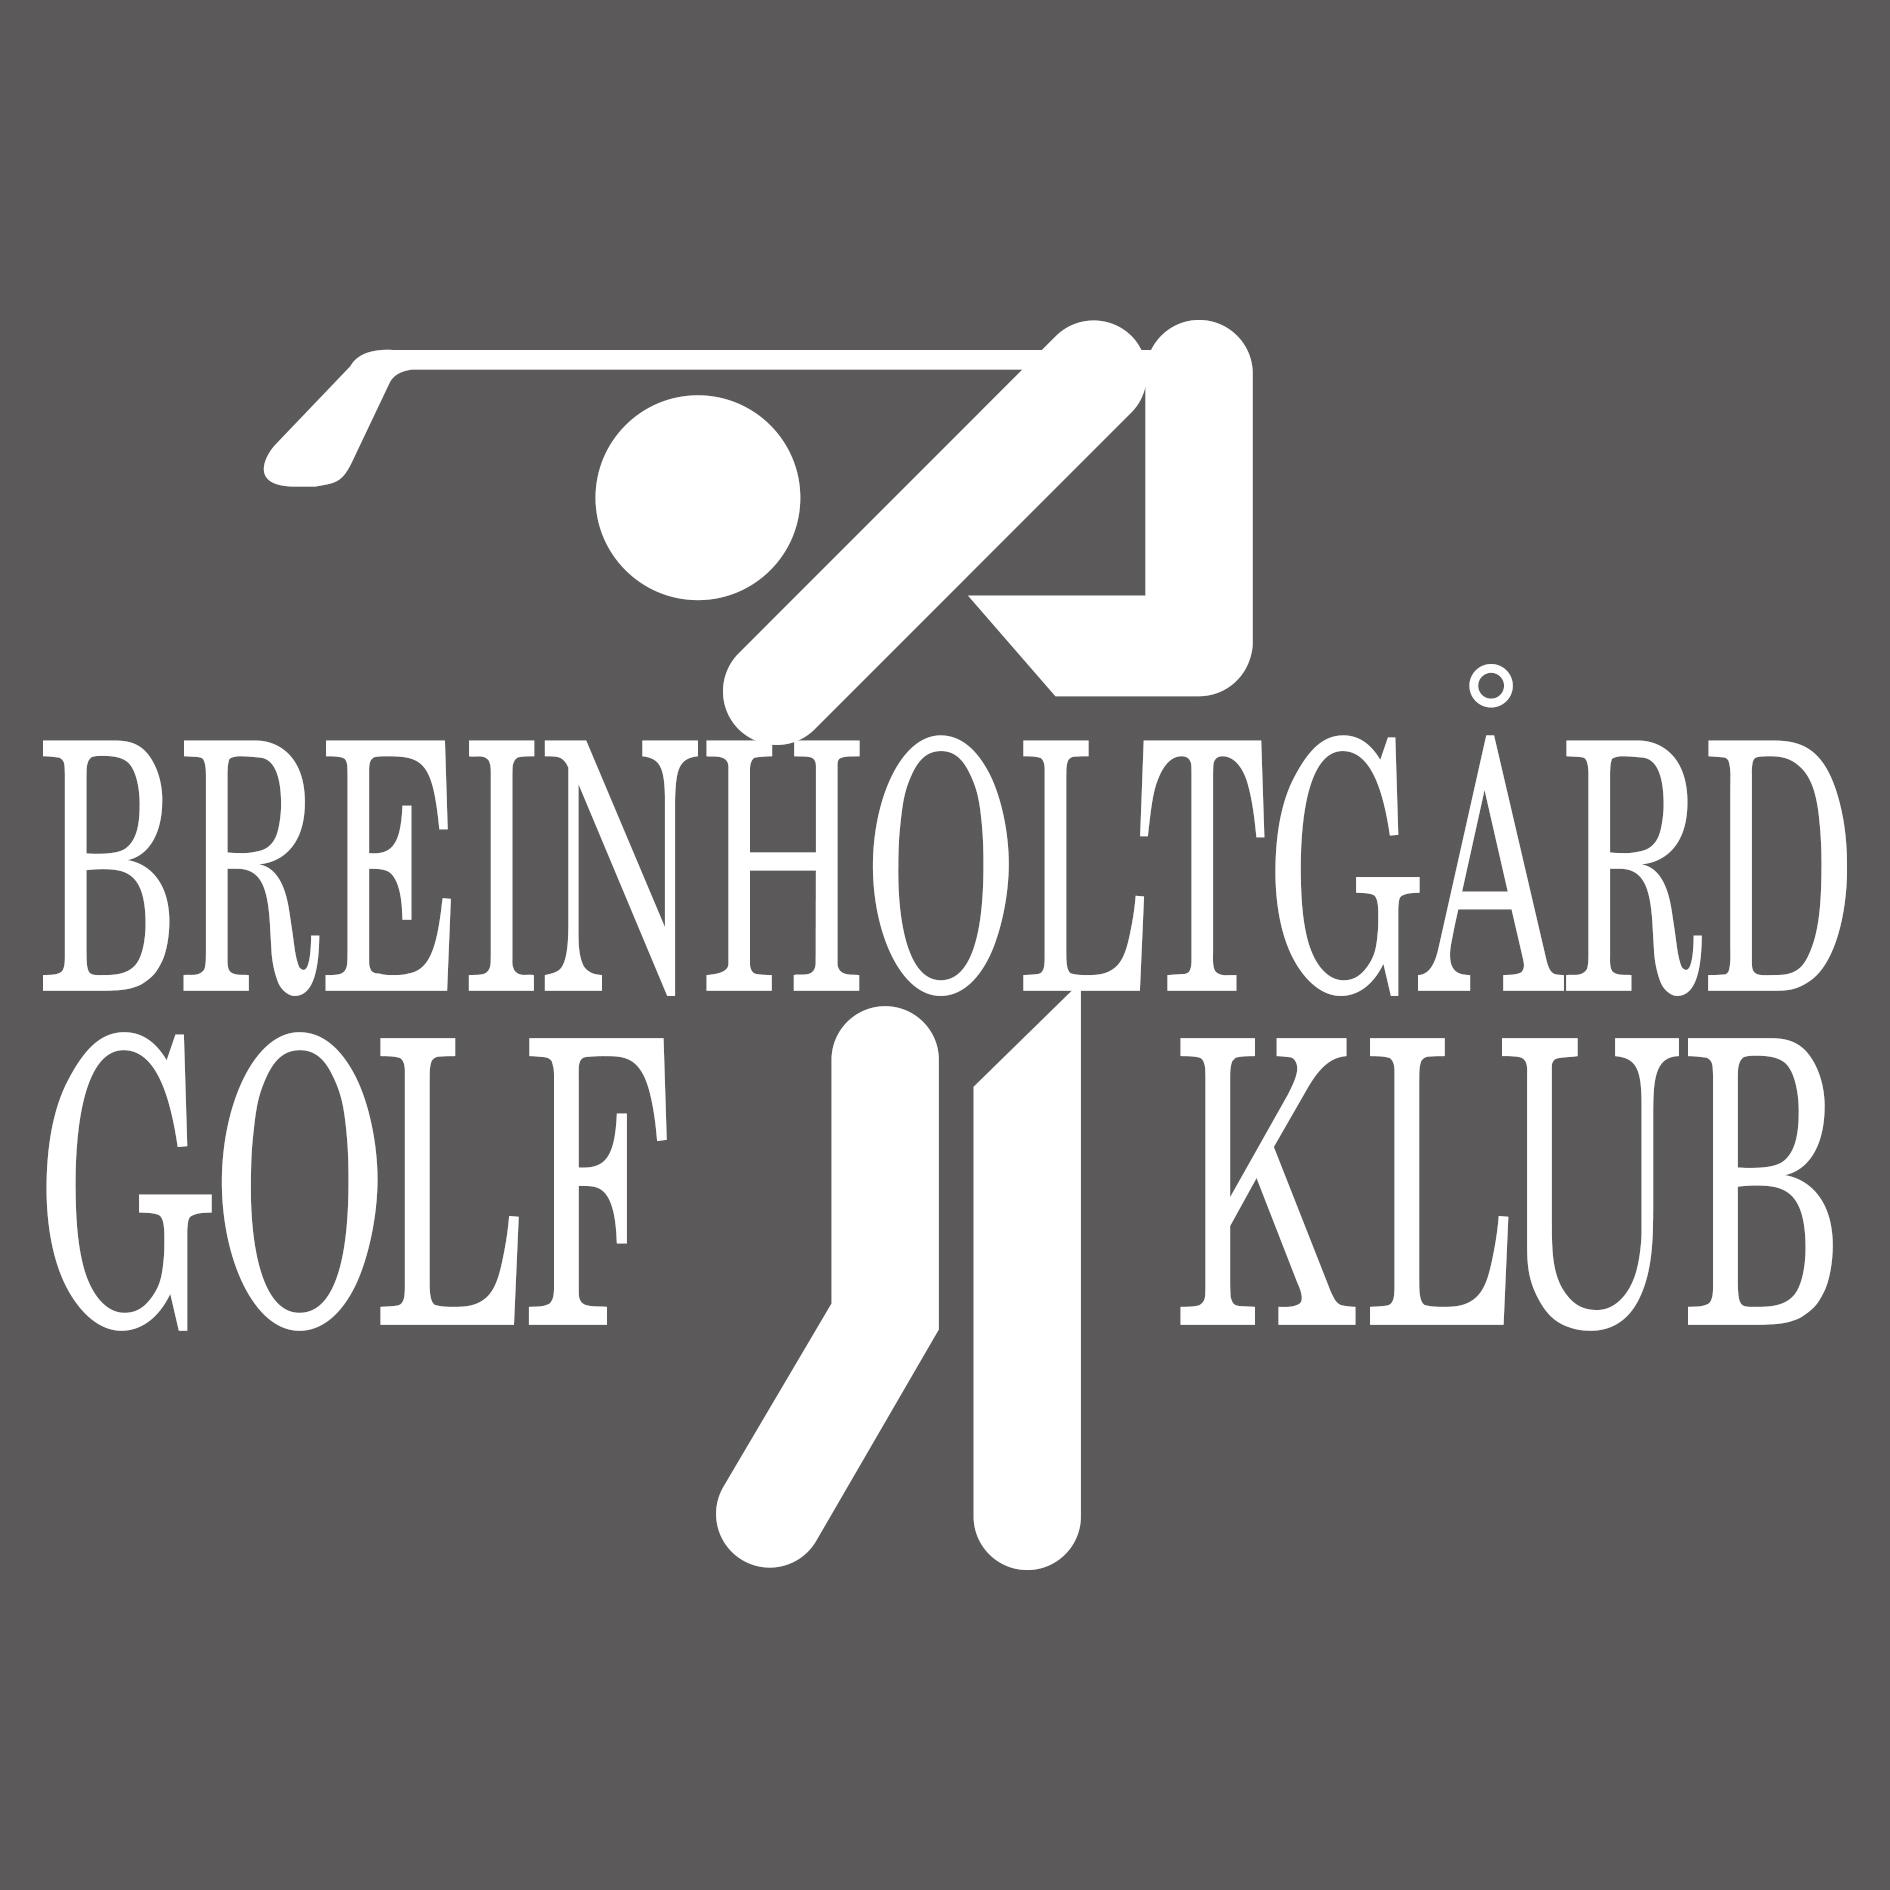 Logo Lille Golfspiller Graa Hvid Breinholtgaard Golf Klub Golfklub Esbjerg